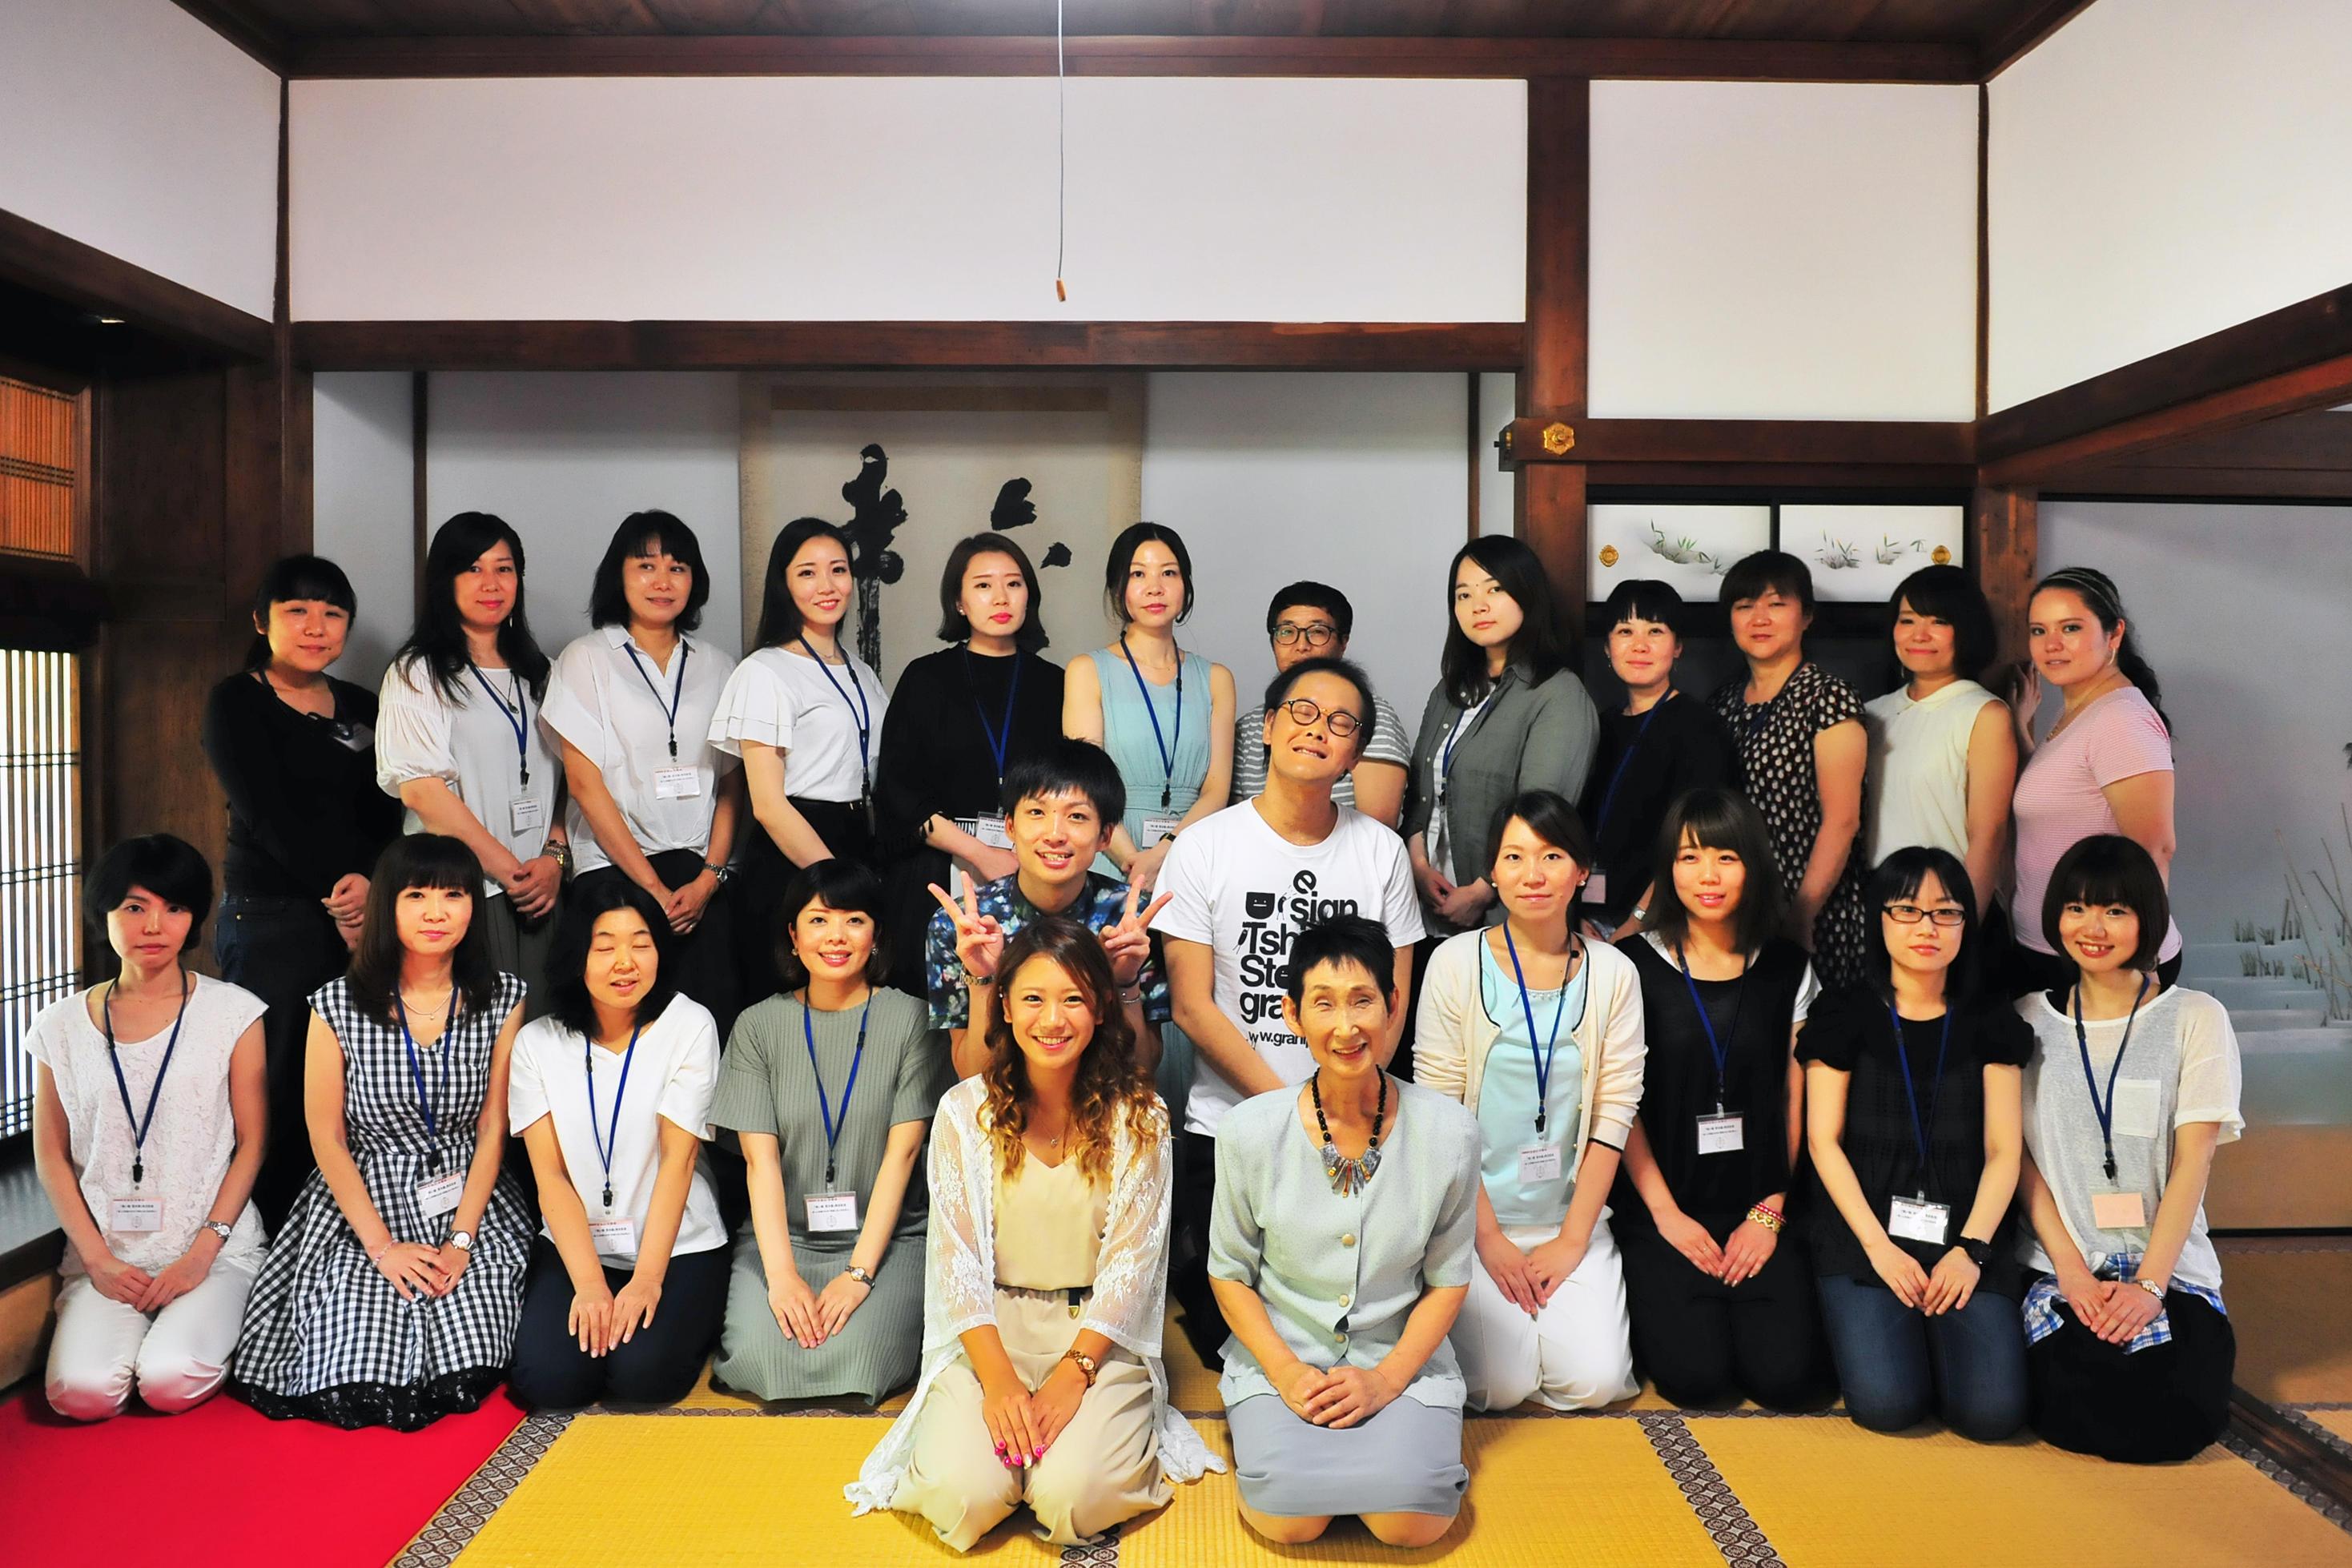 http://news.yoshimoto.co.jp/20160831204427-87bccca5d36753feca127fdcc893cbf7d93ad120.jpg